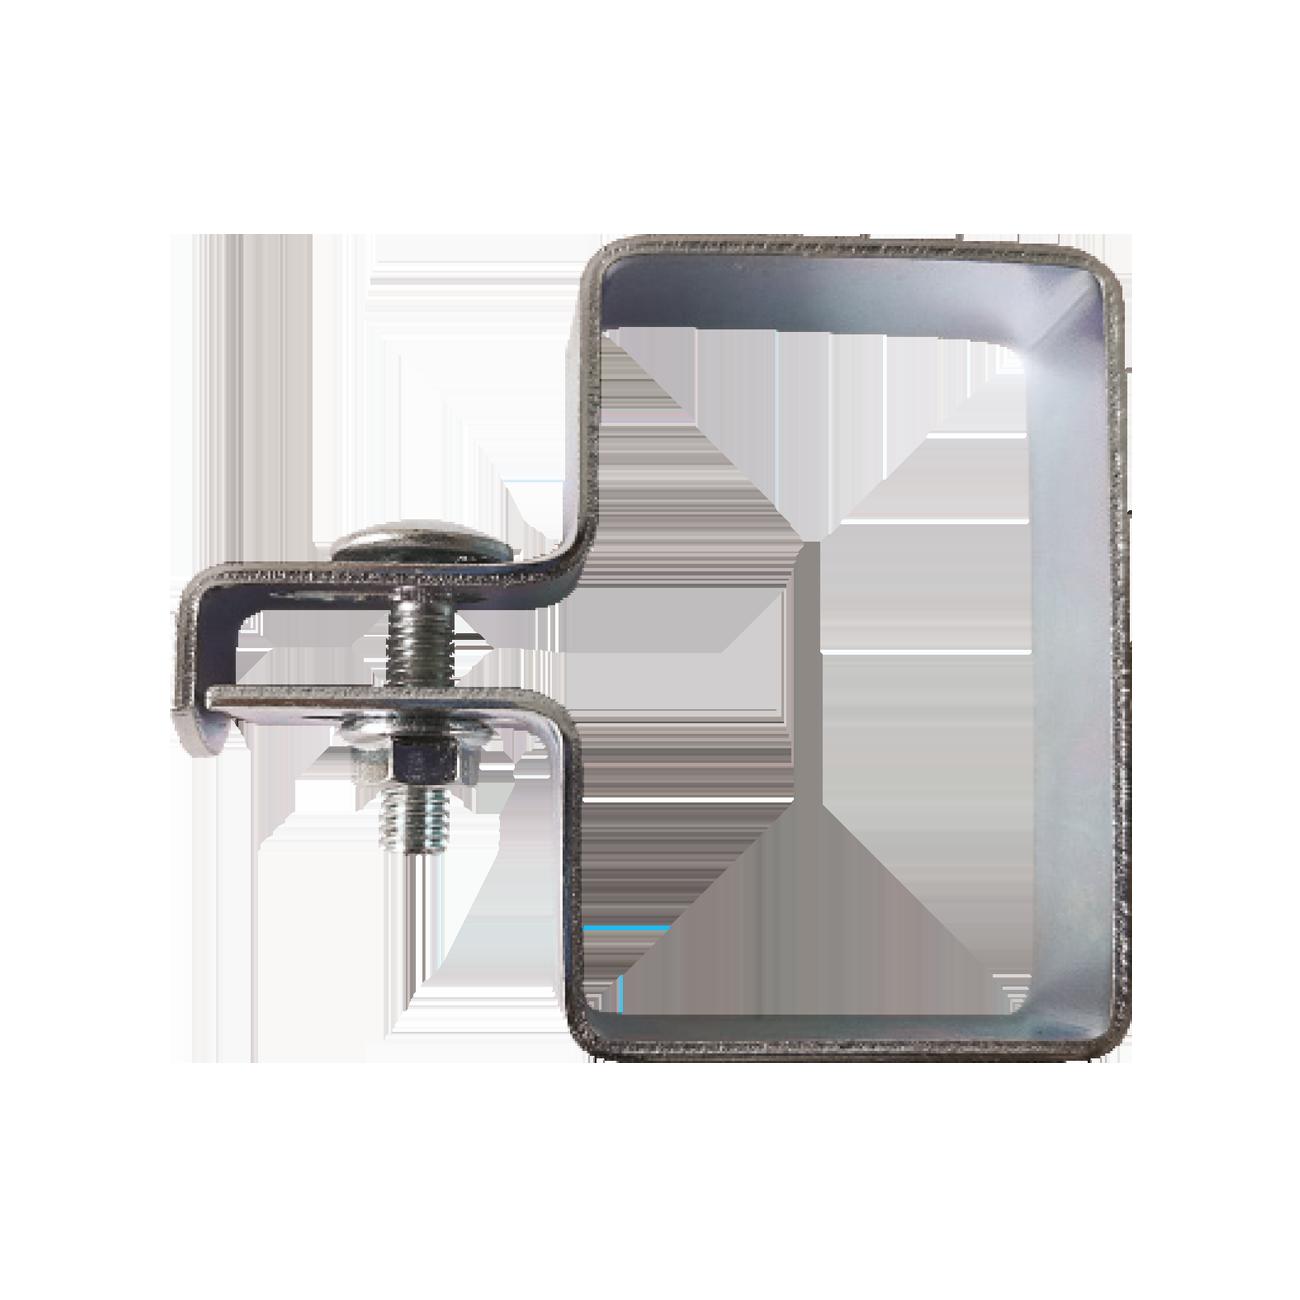 Brida Fixare Capat Pentru Stalpi Rectangulari Dimensiuni Stalp 60×40 Mm Acoperire Zincat Electrolitic